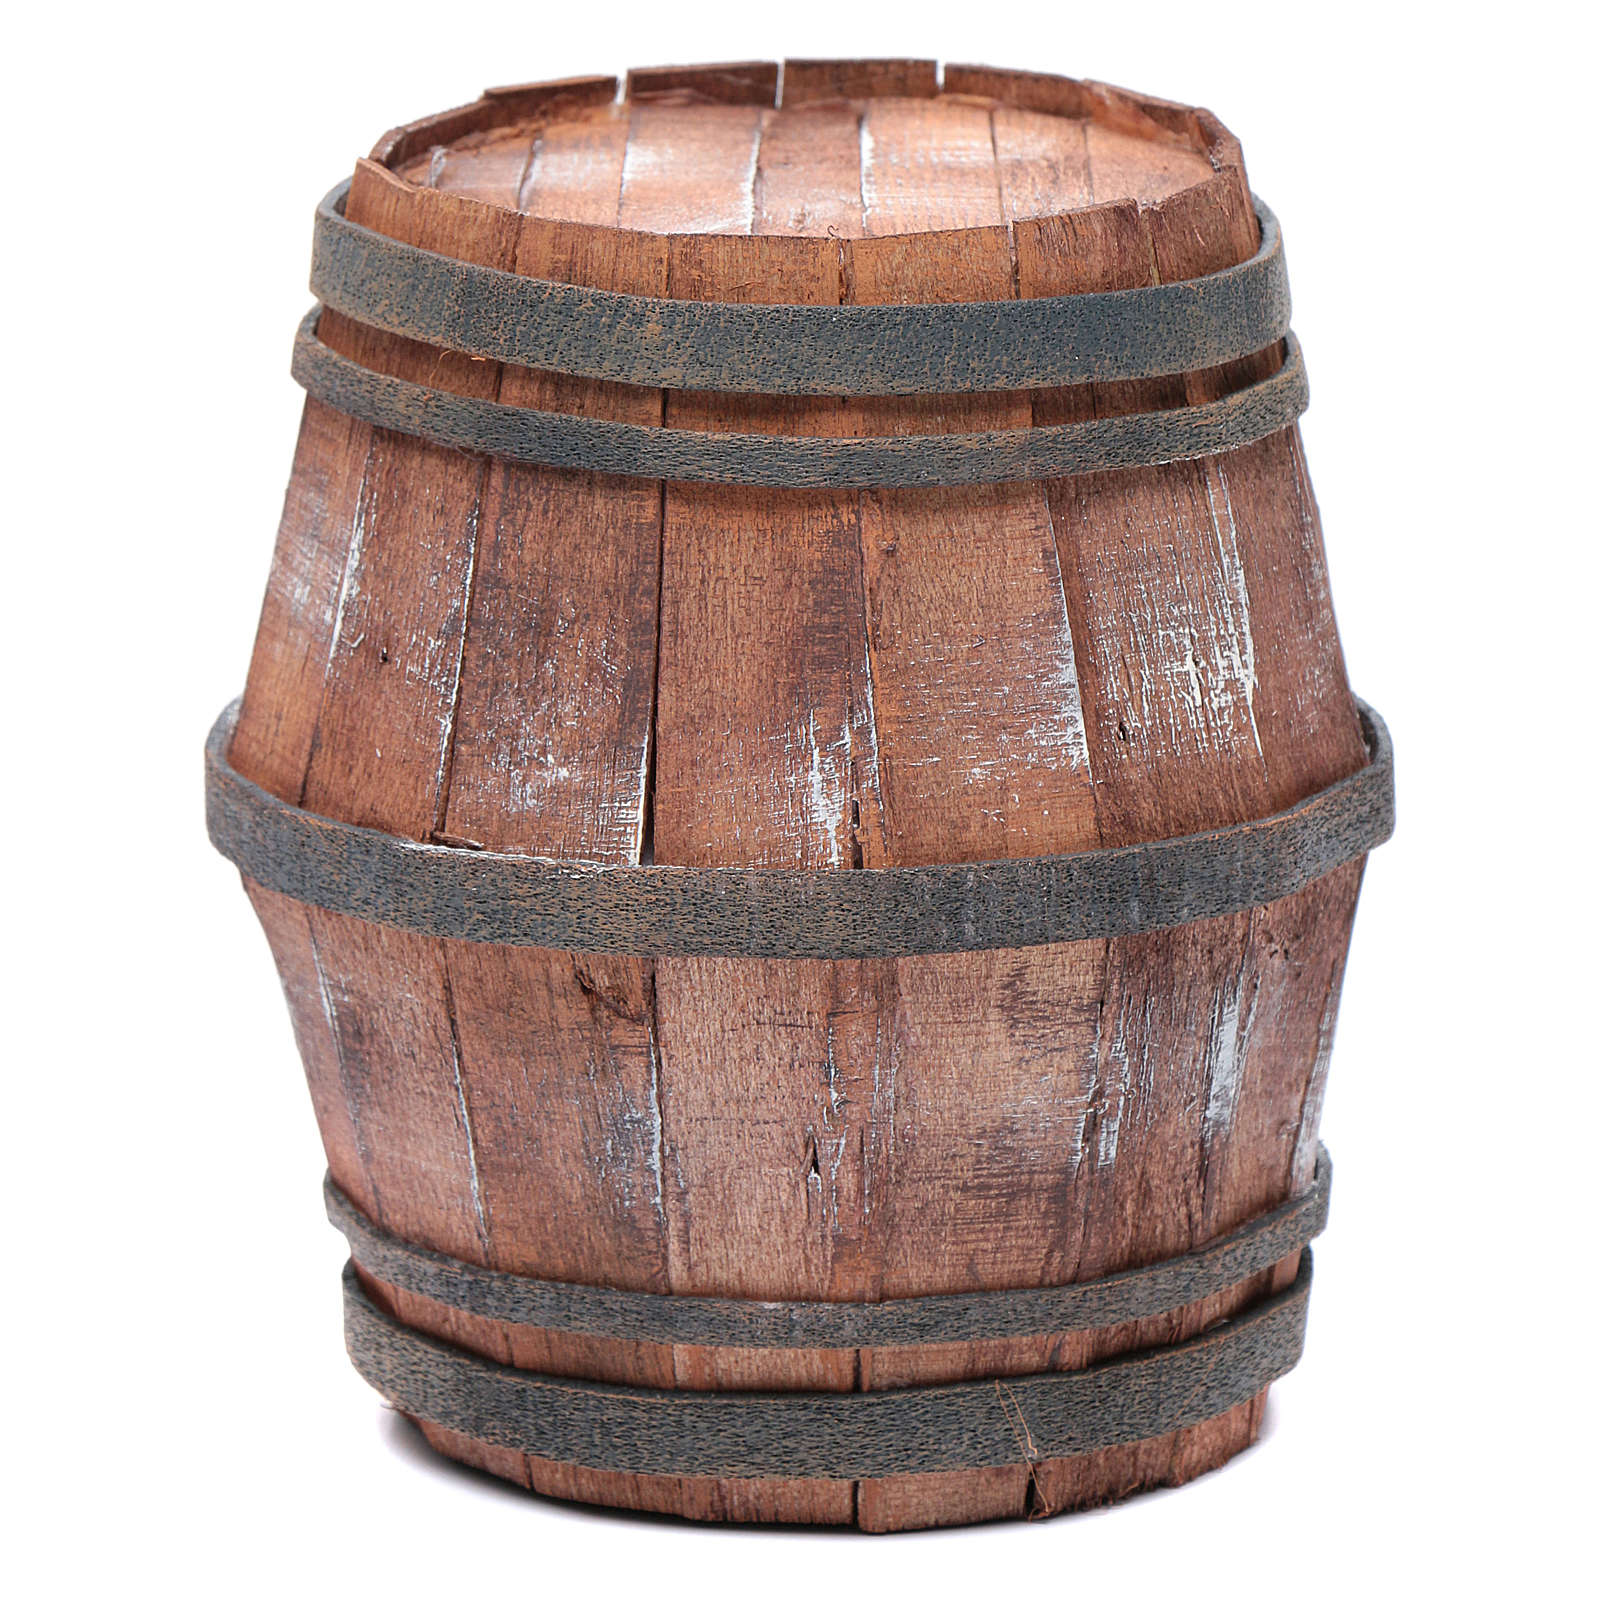 Botte in legno per presepe 15 cm 4